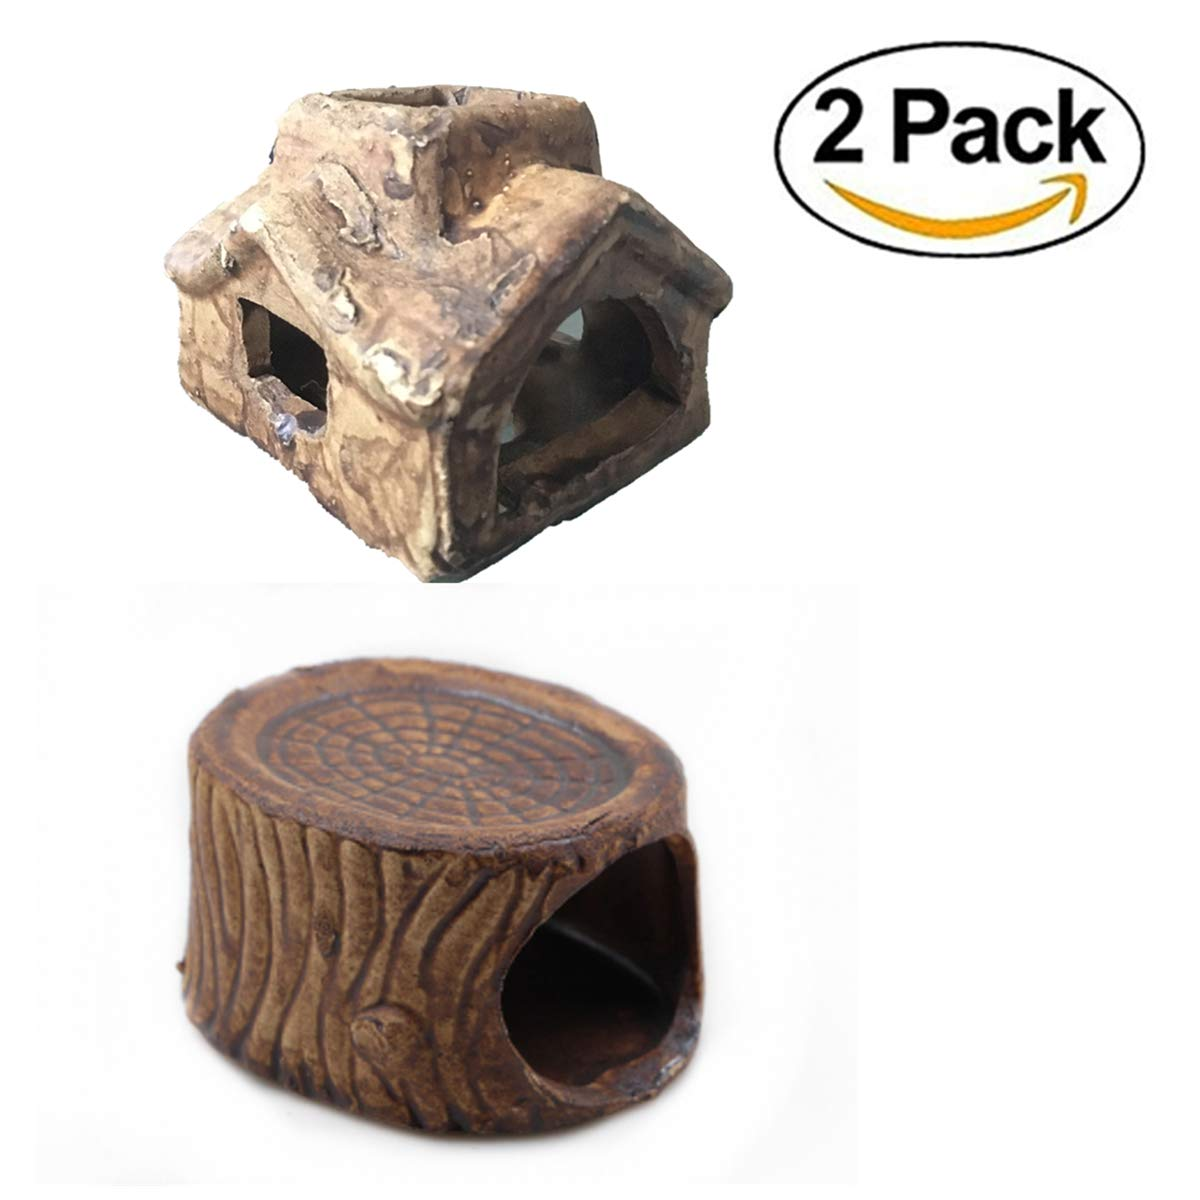 LOYEH Aquarium Decoration House Fish Tank Cave Ornament Hiding For Fun 3.9x3.1x2.3cm, 2 Pack